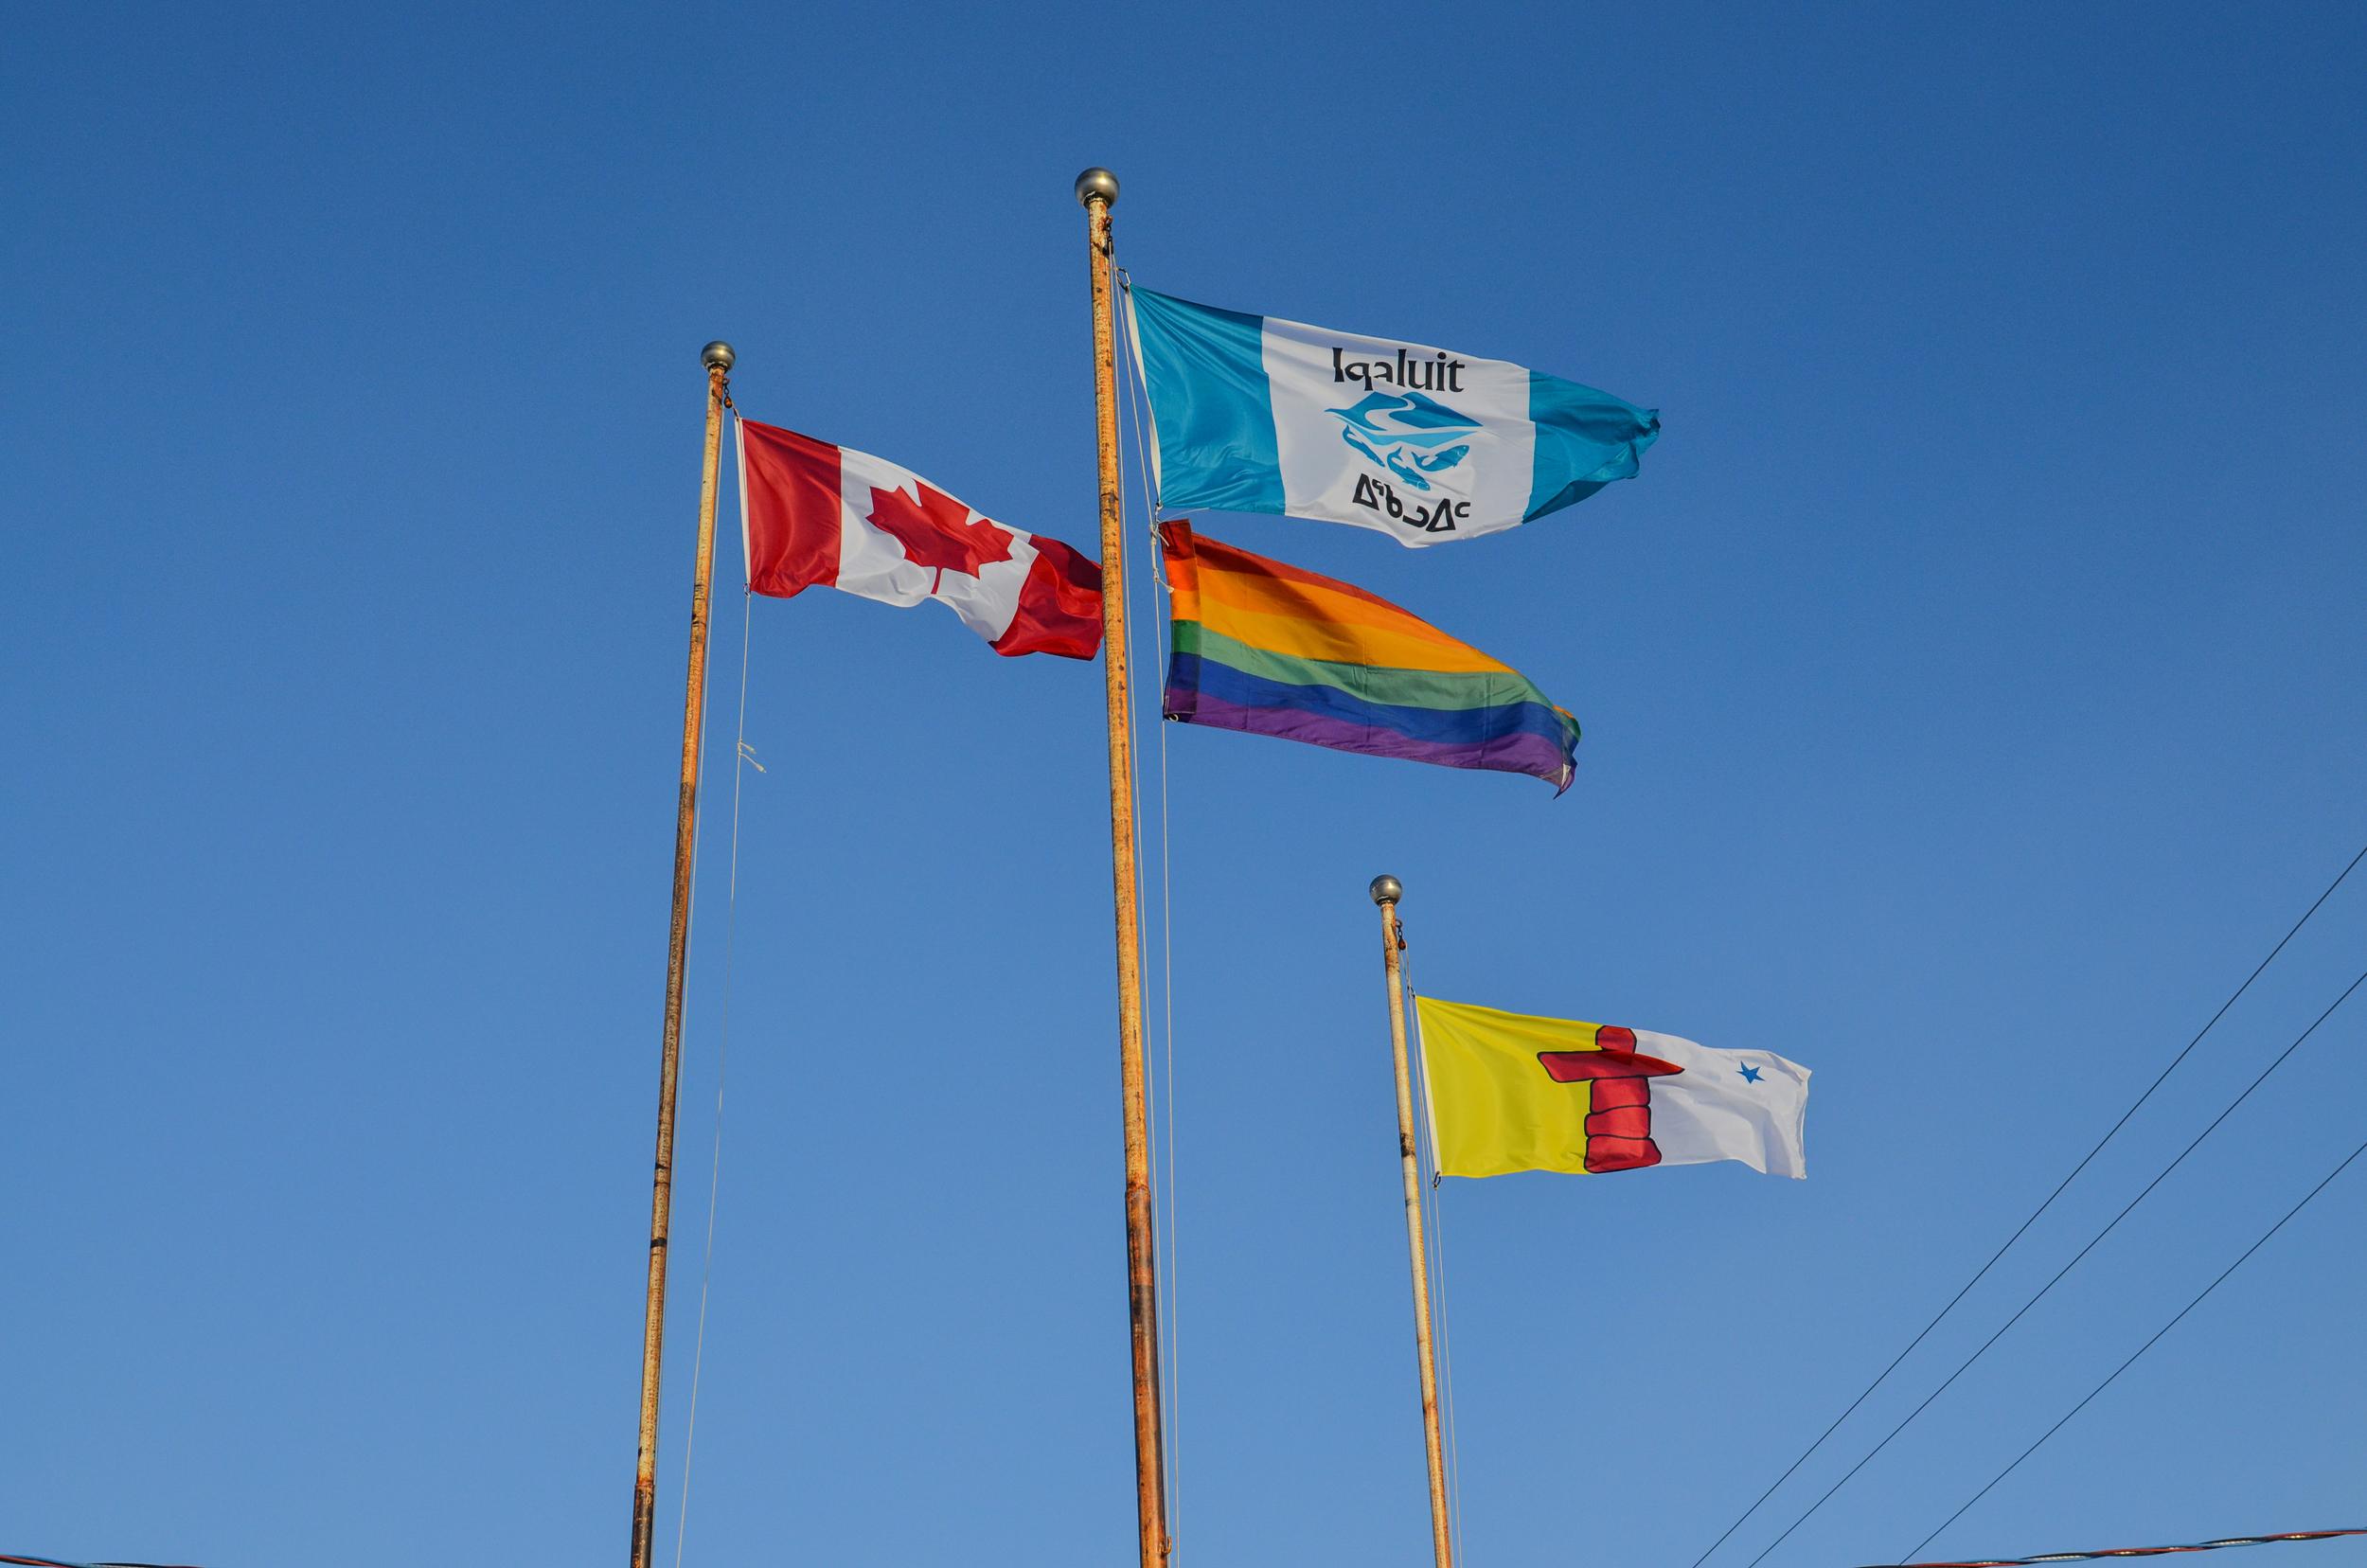 Canada, Nunavut, Iqaluit, and Pride.